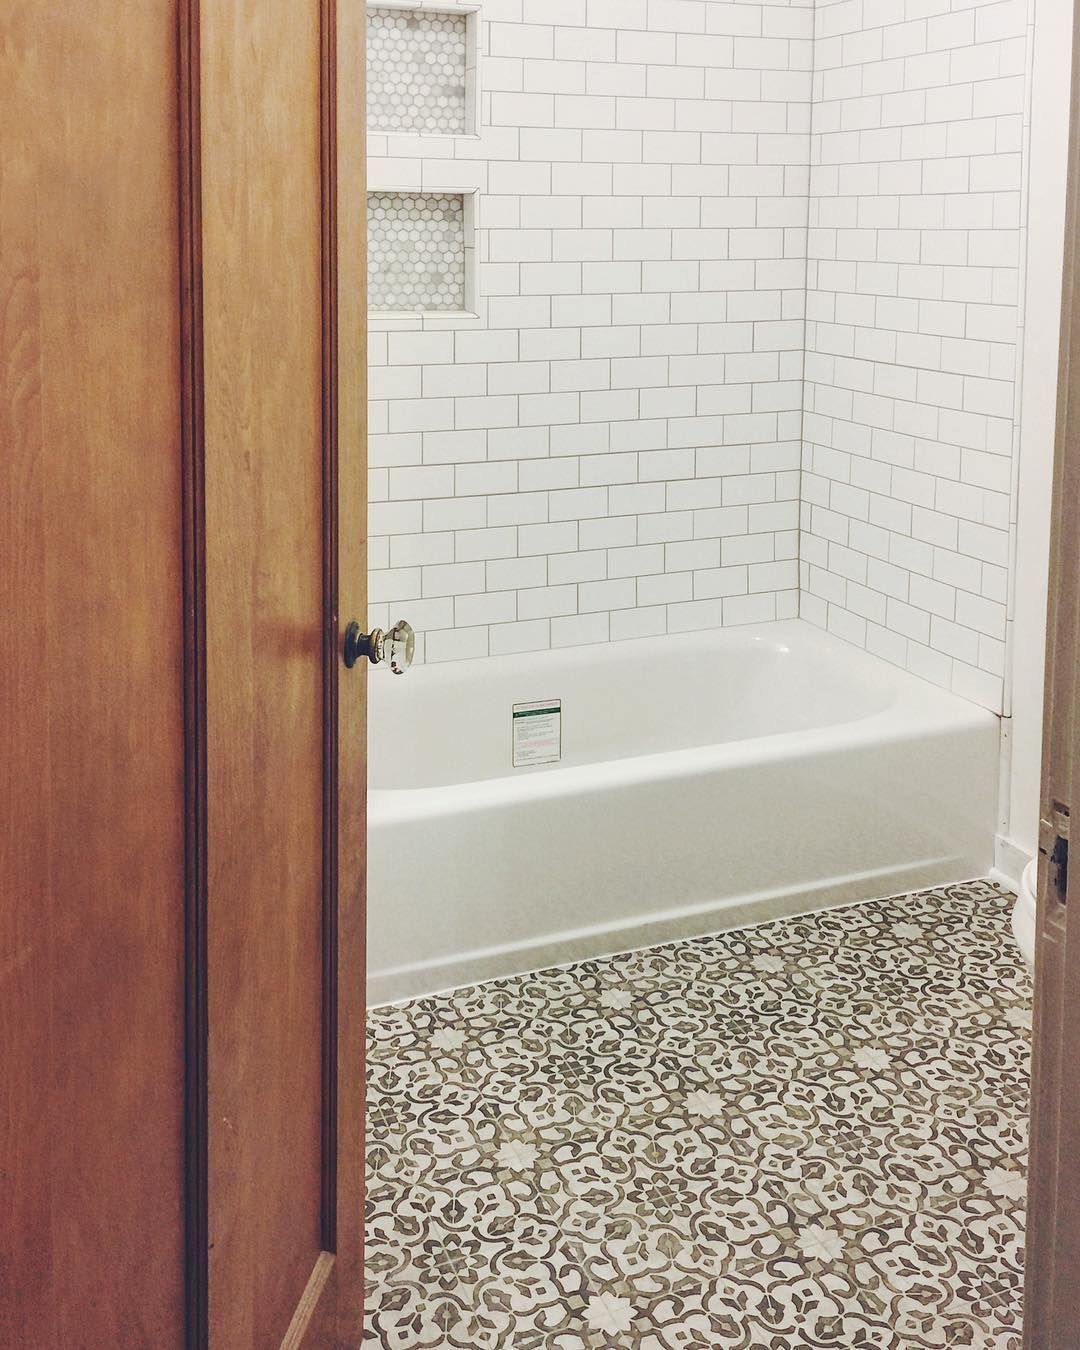 Mannington Filigree In Iron Vinyl Flooring Kitchen Bathroom Vinyl Patterned Floor Tiles